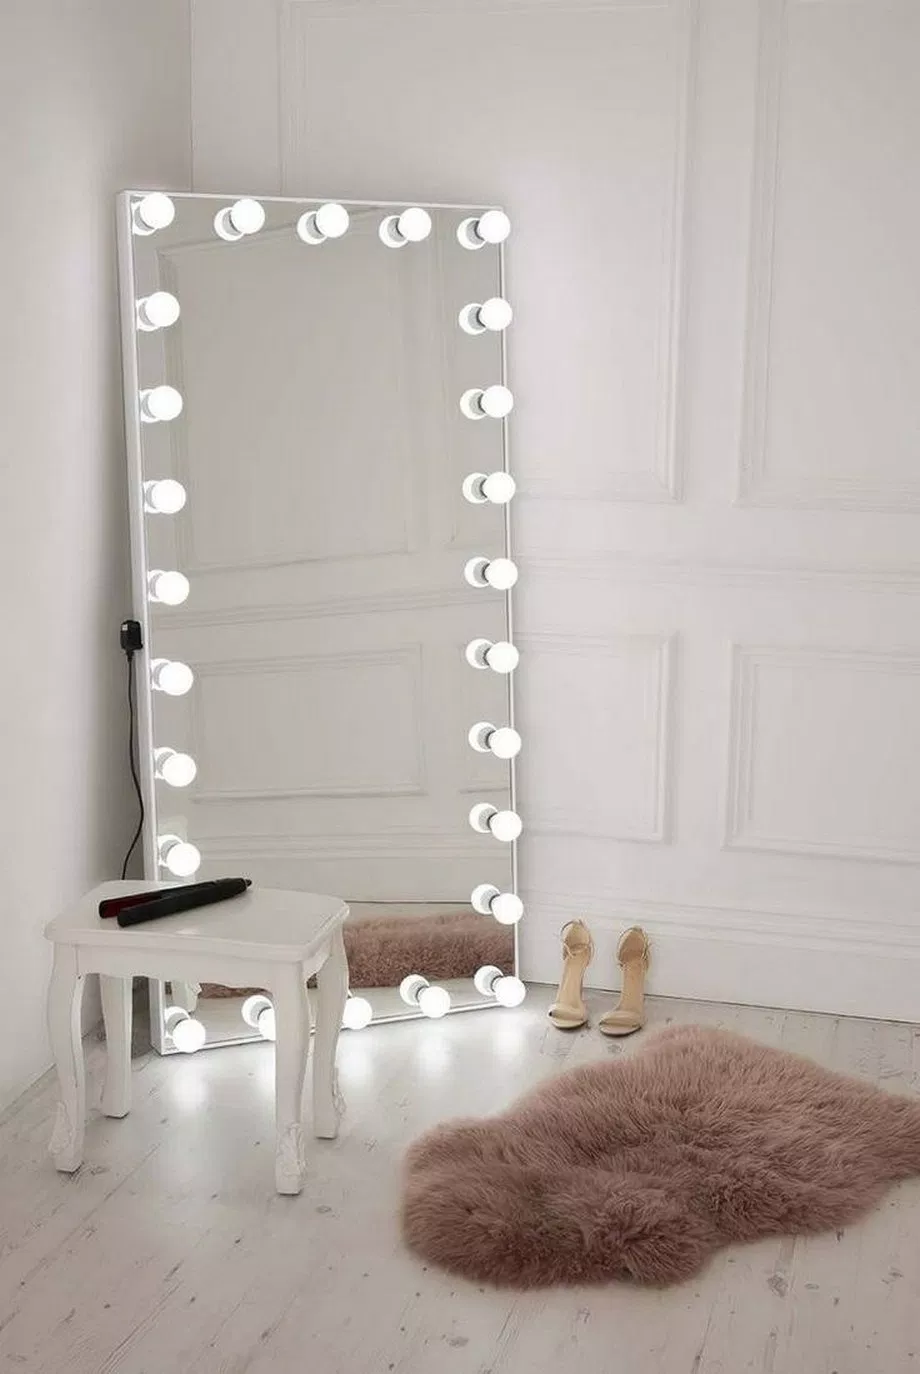 36 Simple Makeup Room Ideas Organizer For Proper Storage